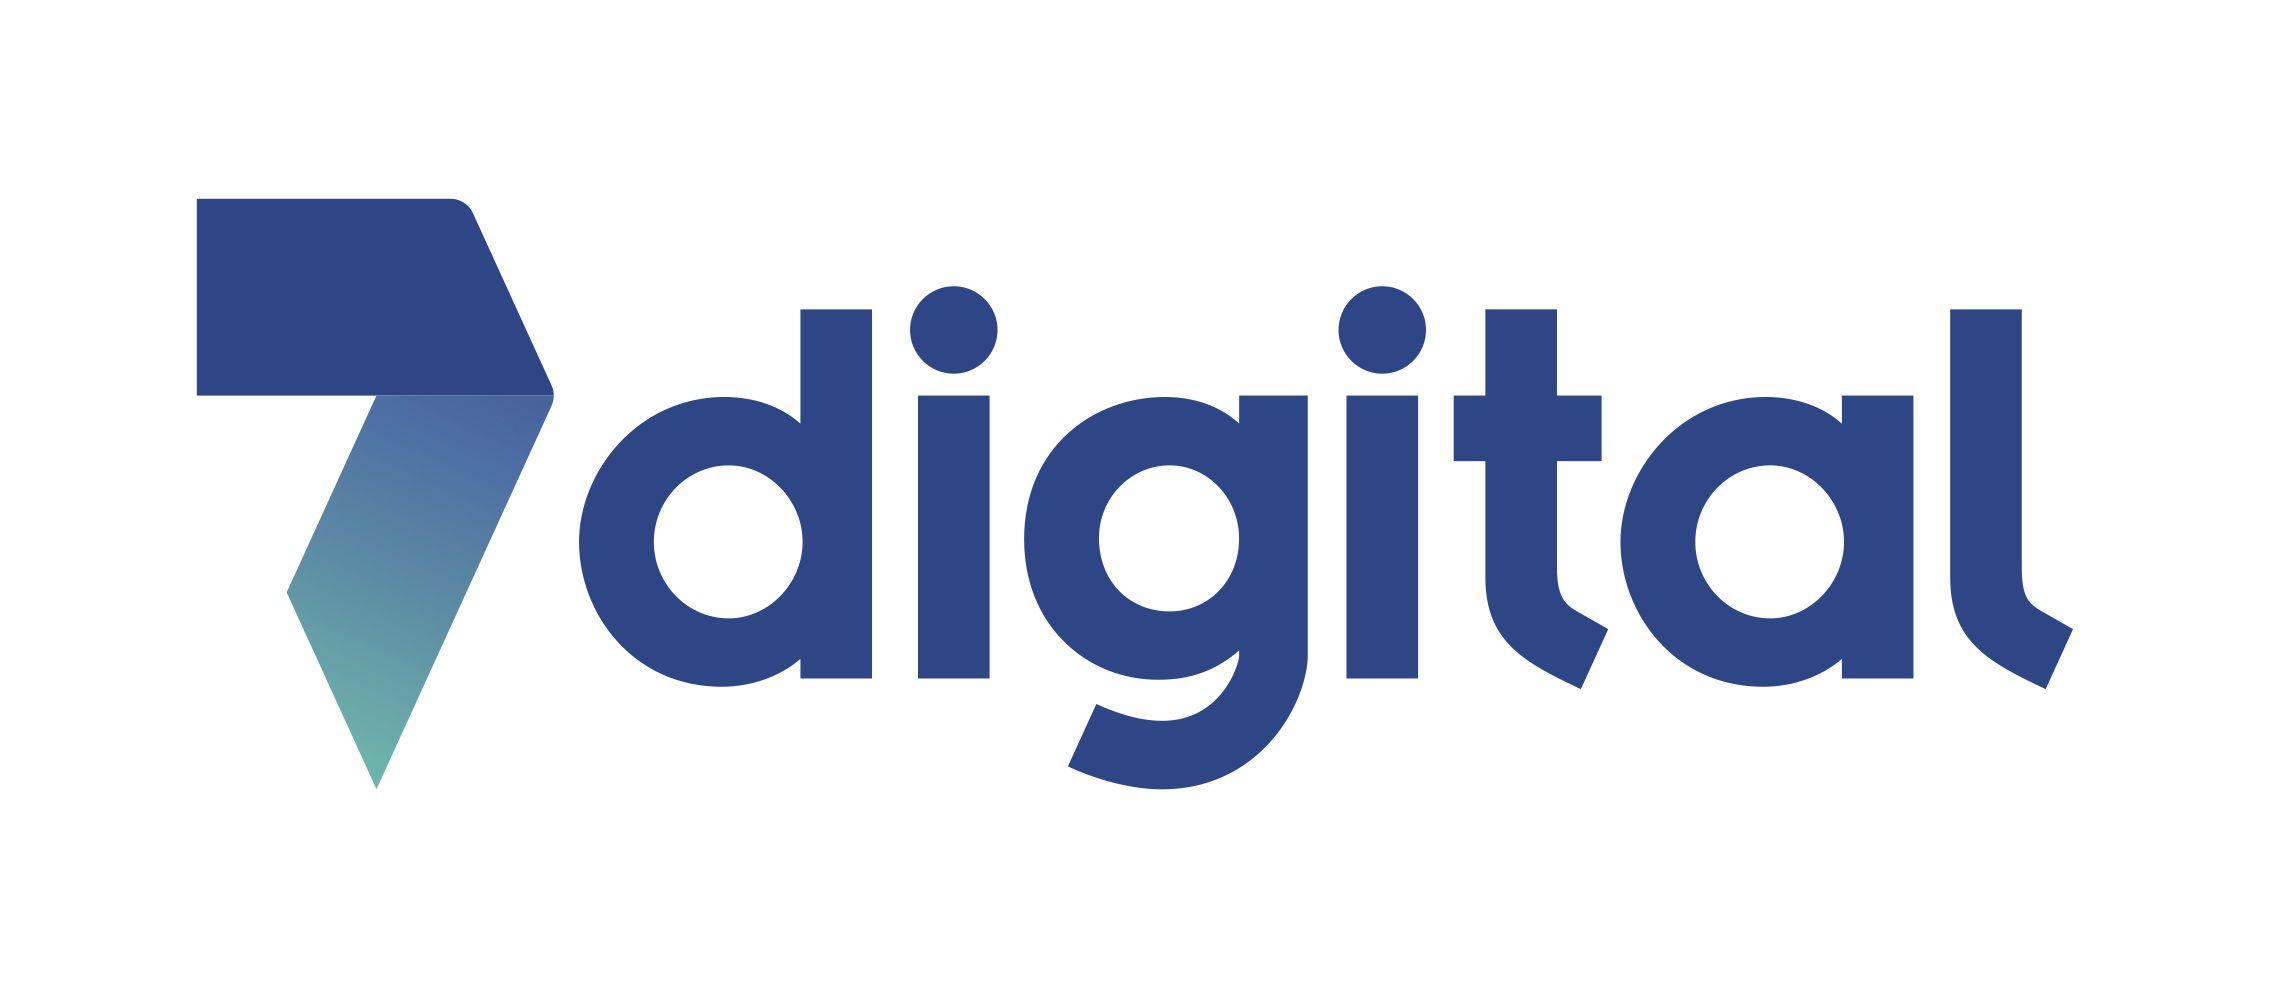 Logo of 7 Digital music download service